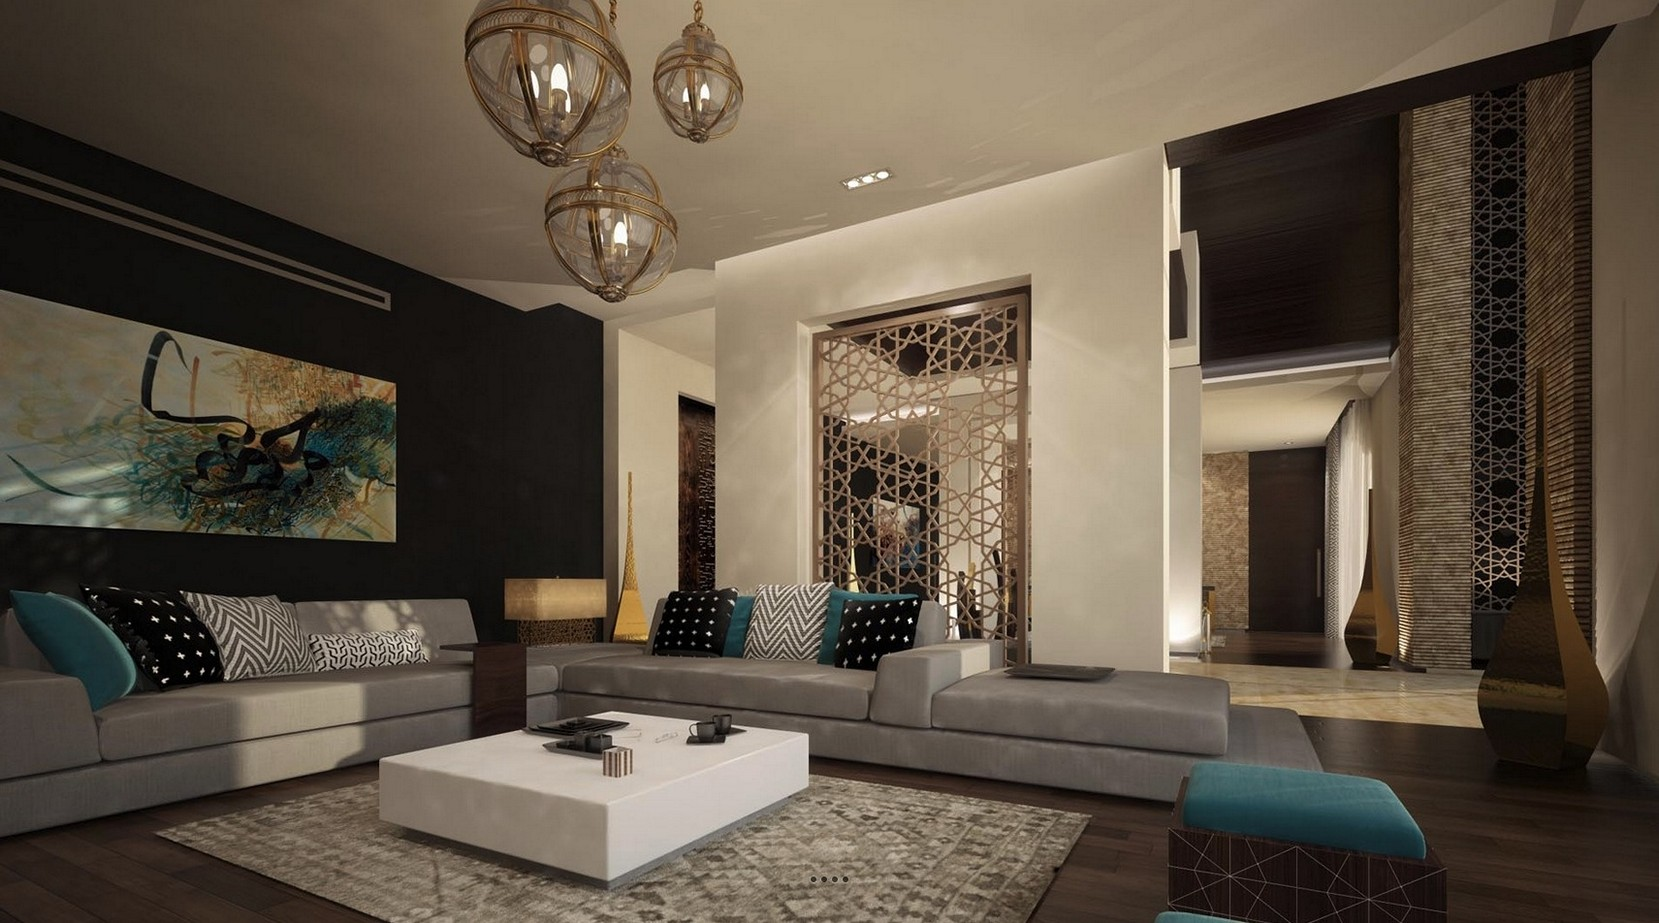 living room designs ideas photo - 8